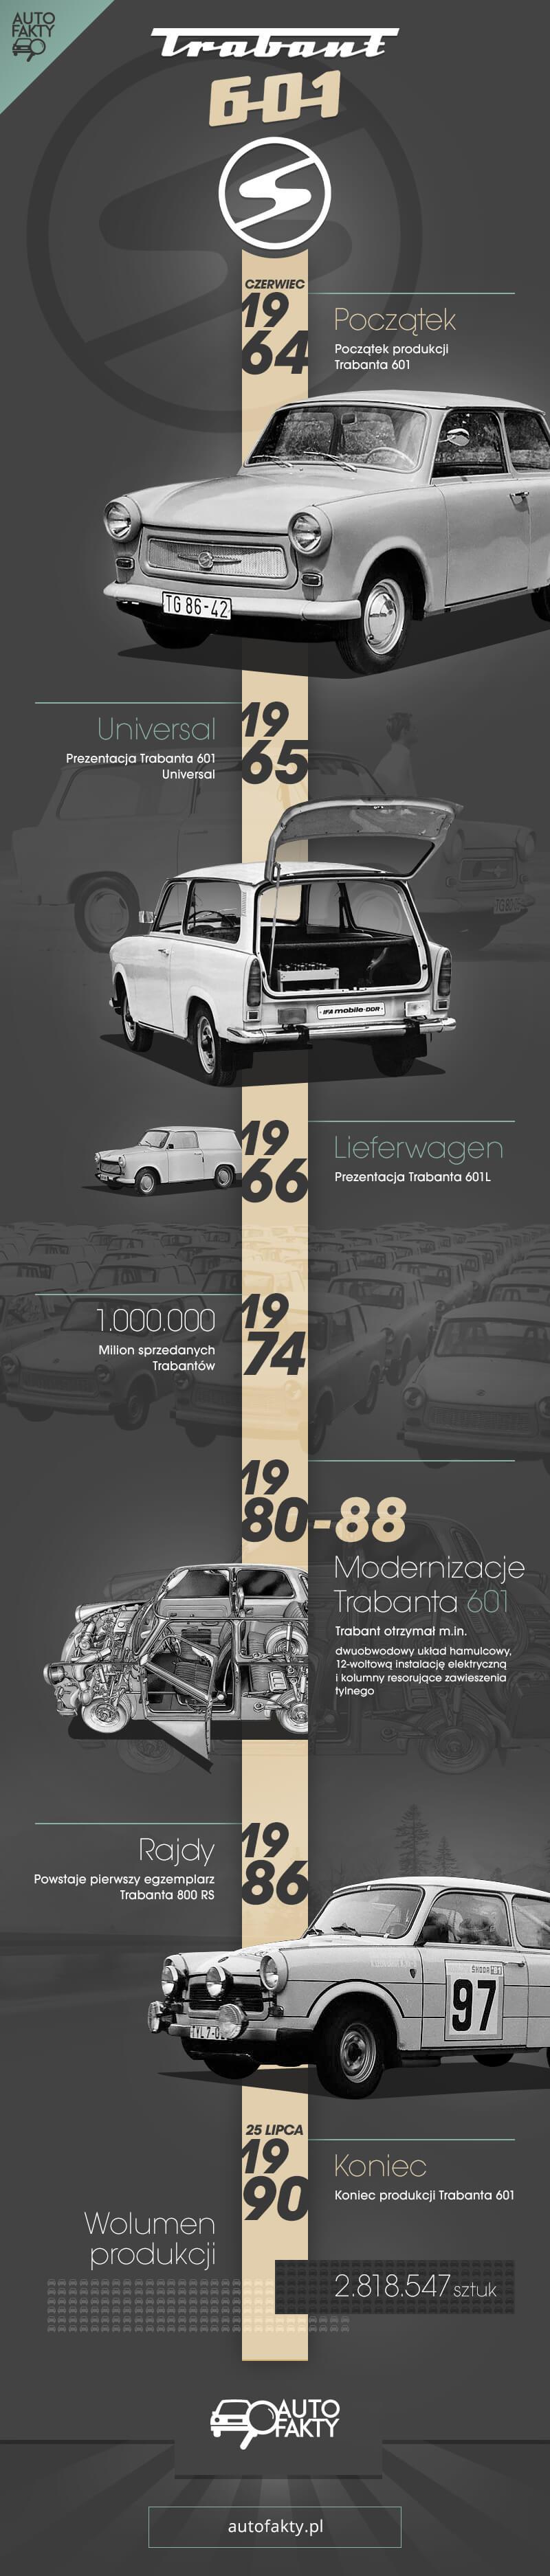 Garaż Polaka - infografika | Autofakty.pl